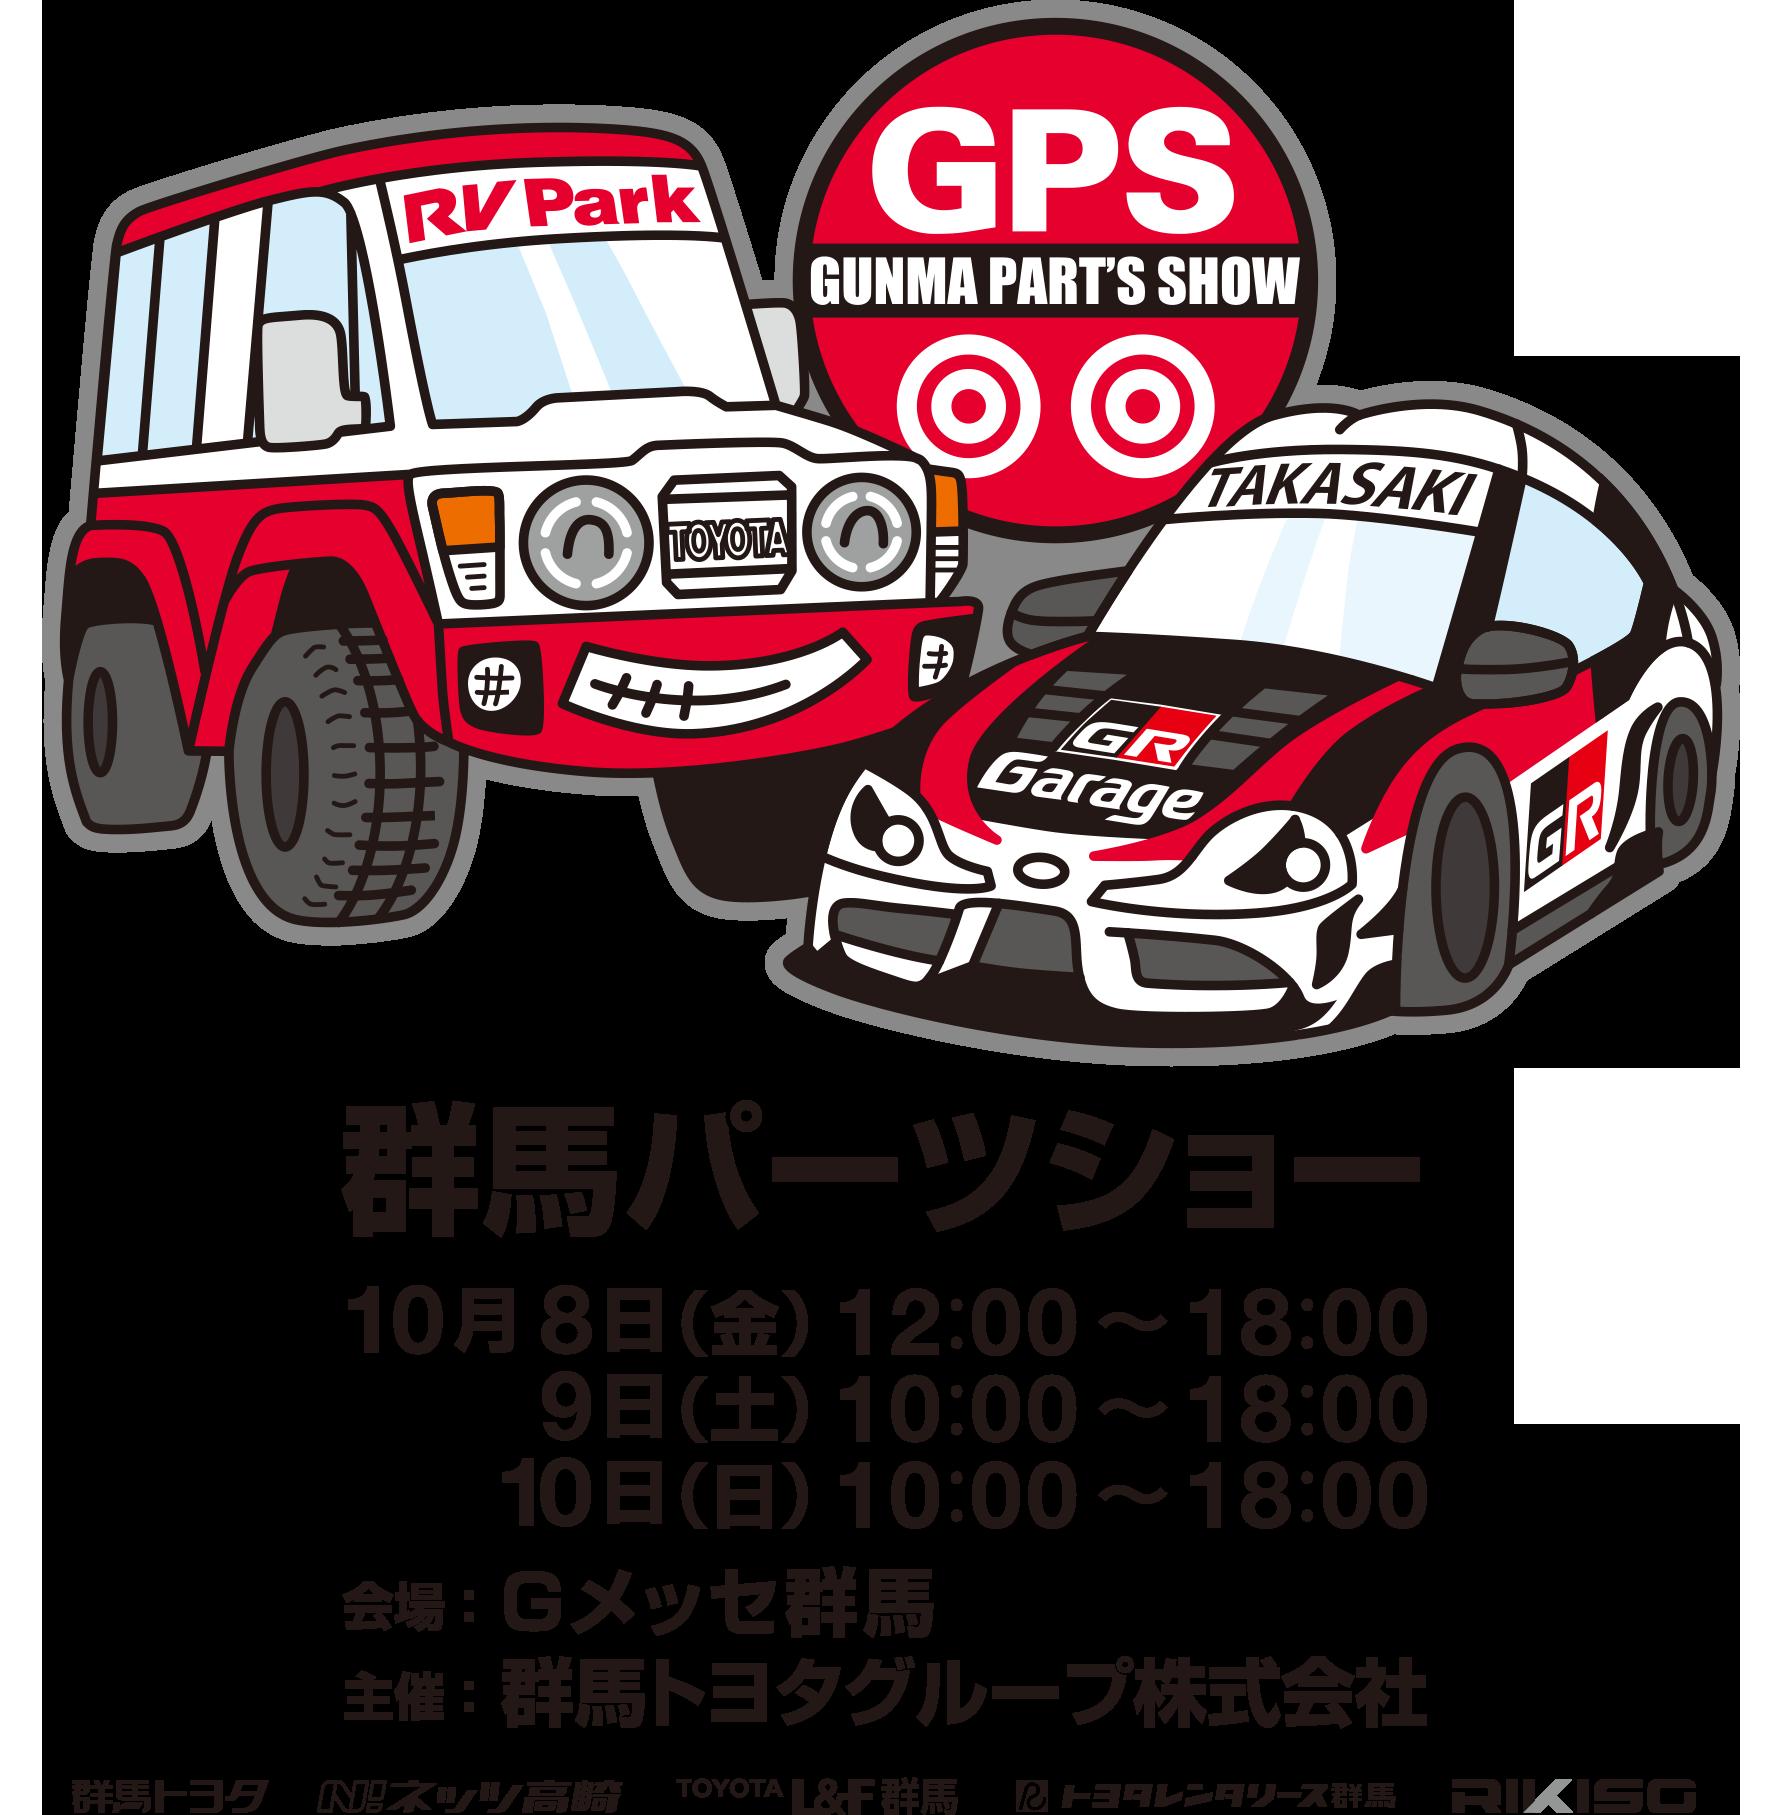 GPSロゴ